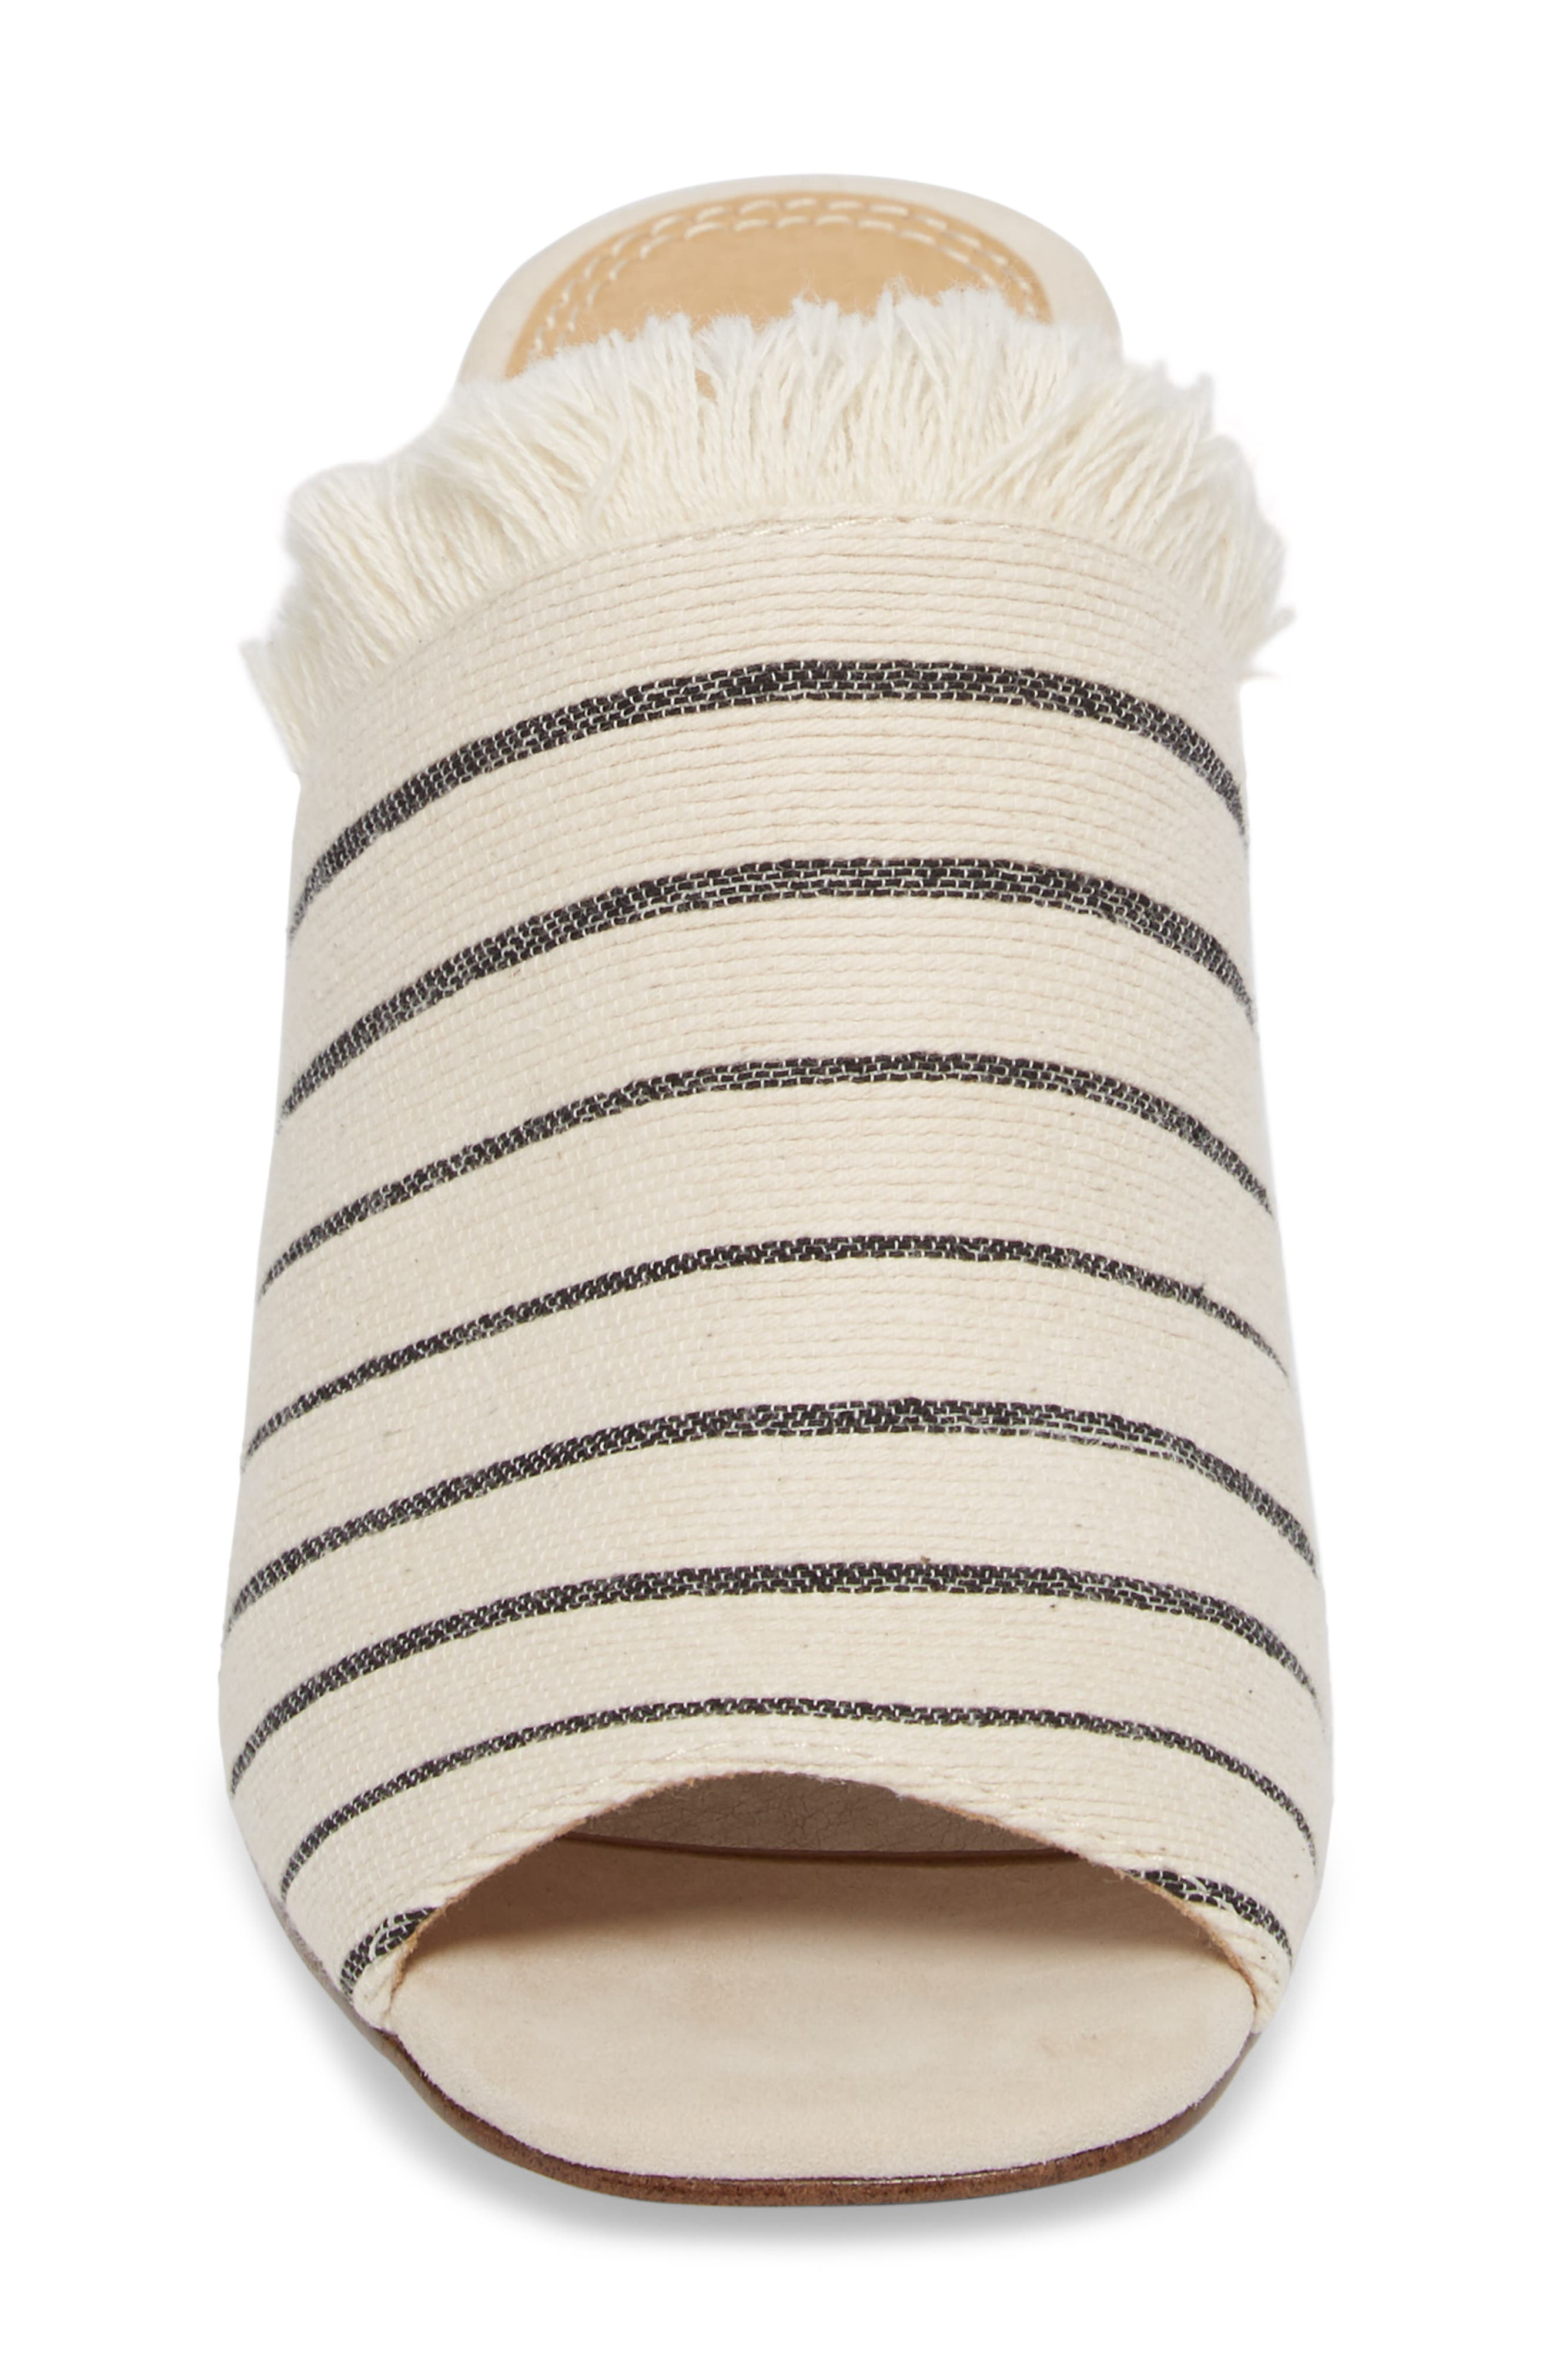 Baron Fringed Block Heel Slide,                             Alternate thumbnail 4, color,                             Cream Leather